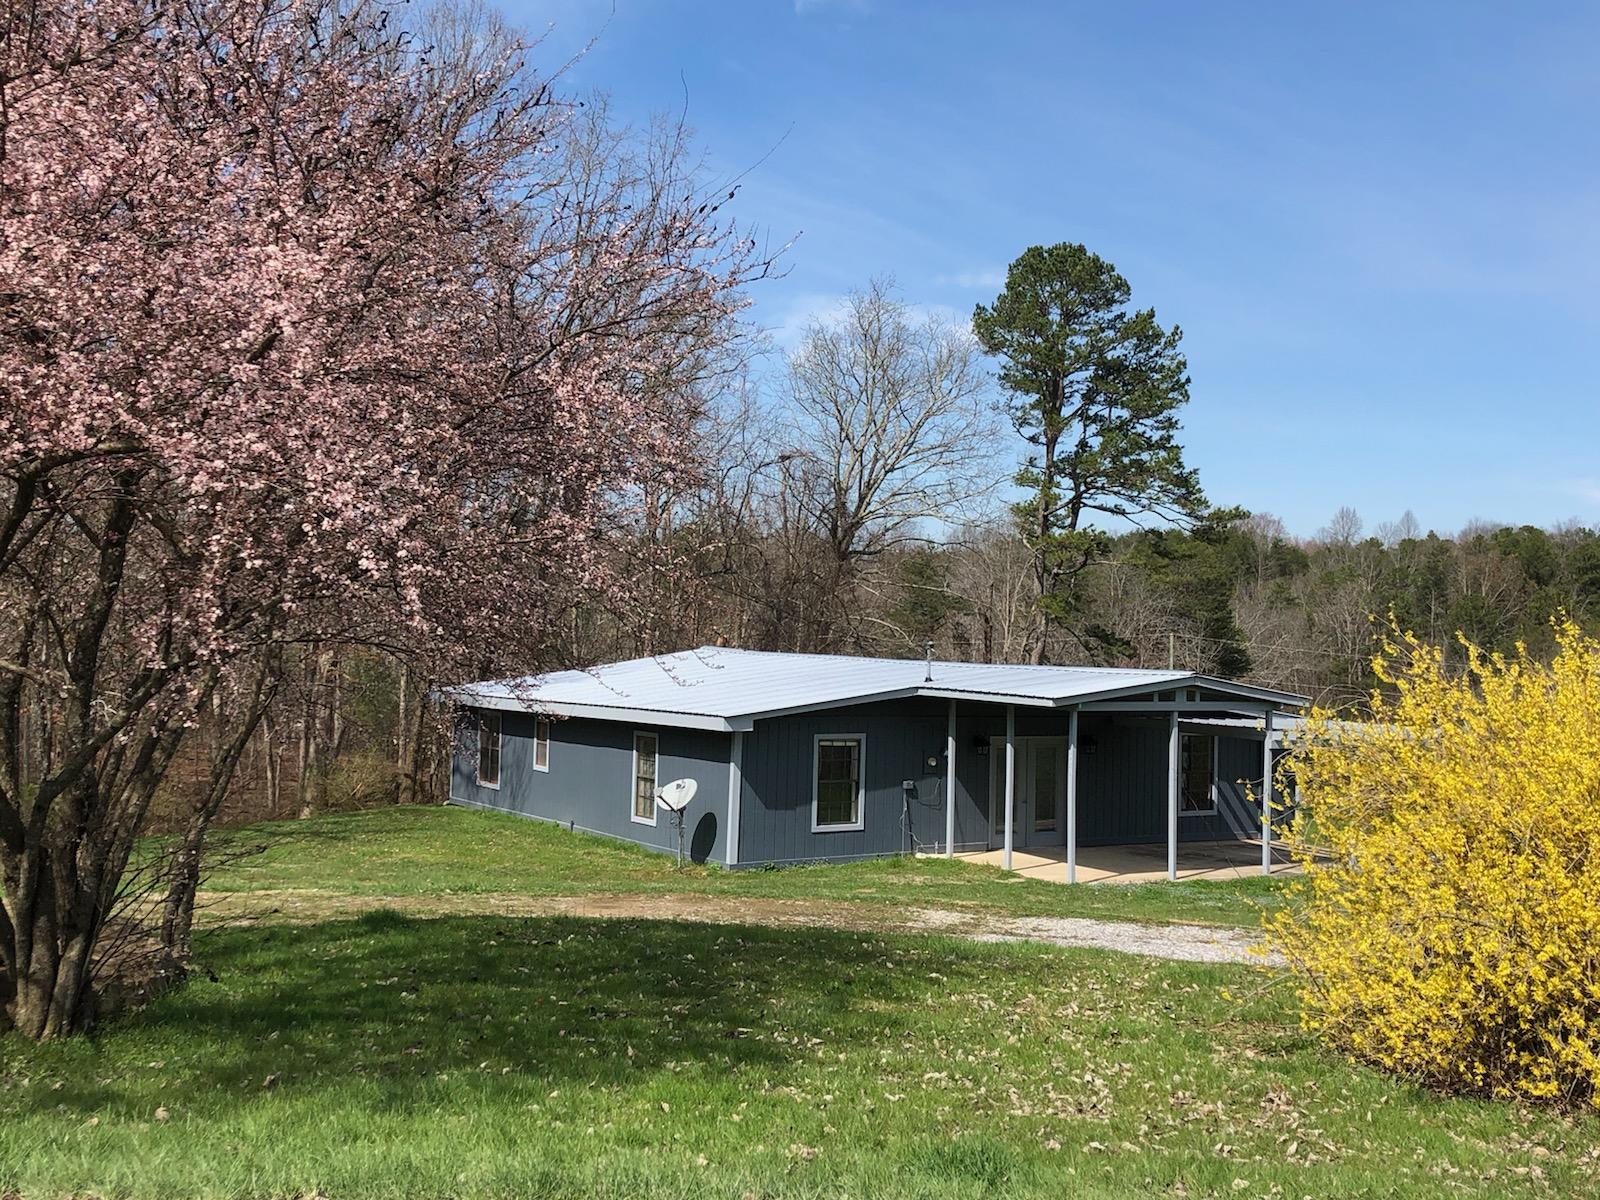 36 Pebblebrook Ln, Trenton, GA 30752